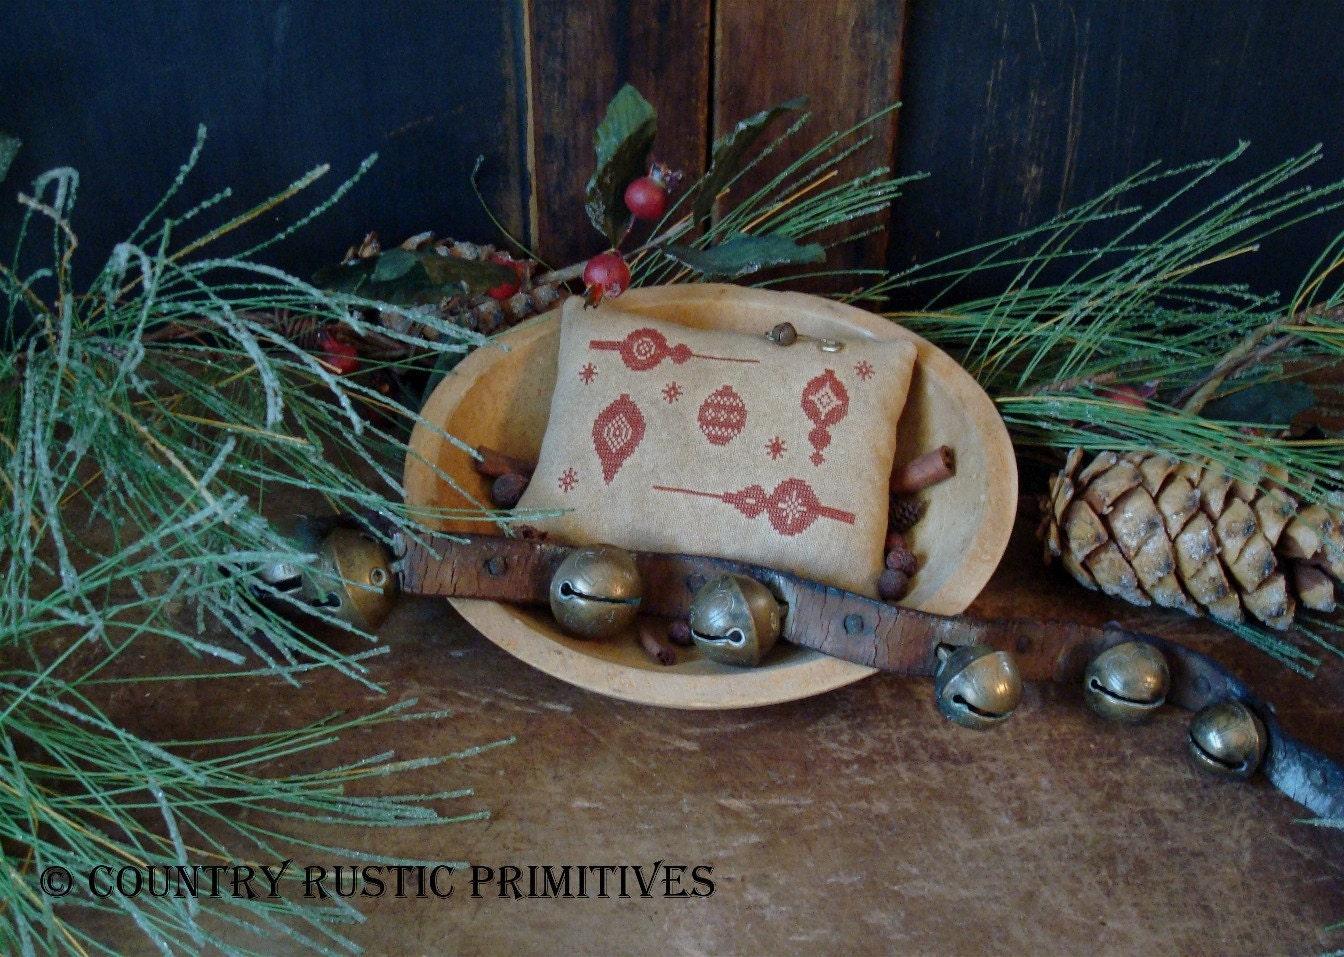 Four Flakey Fellows Primitive Snowman Ornament Pattern